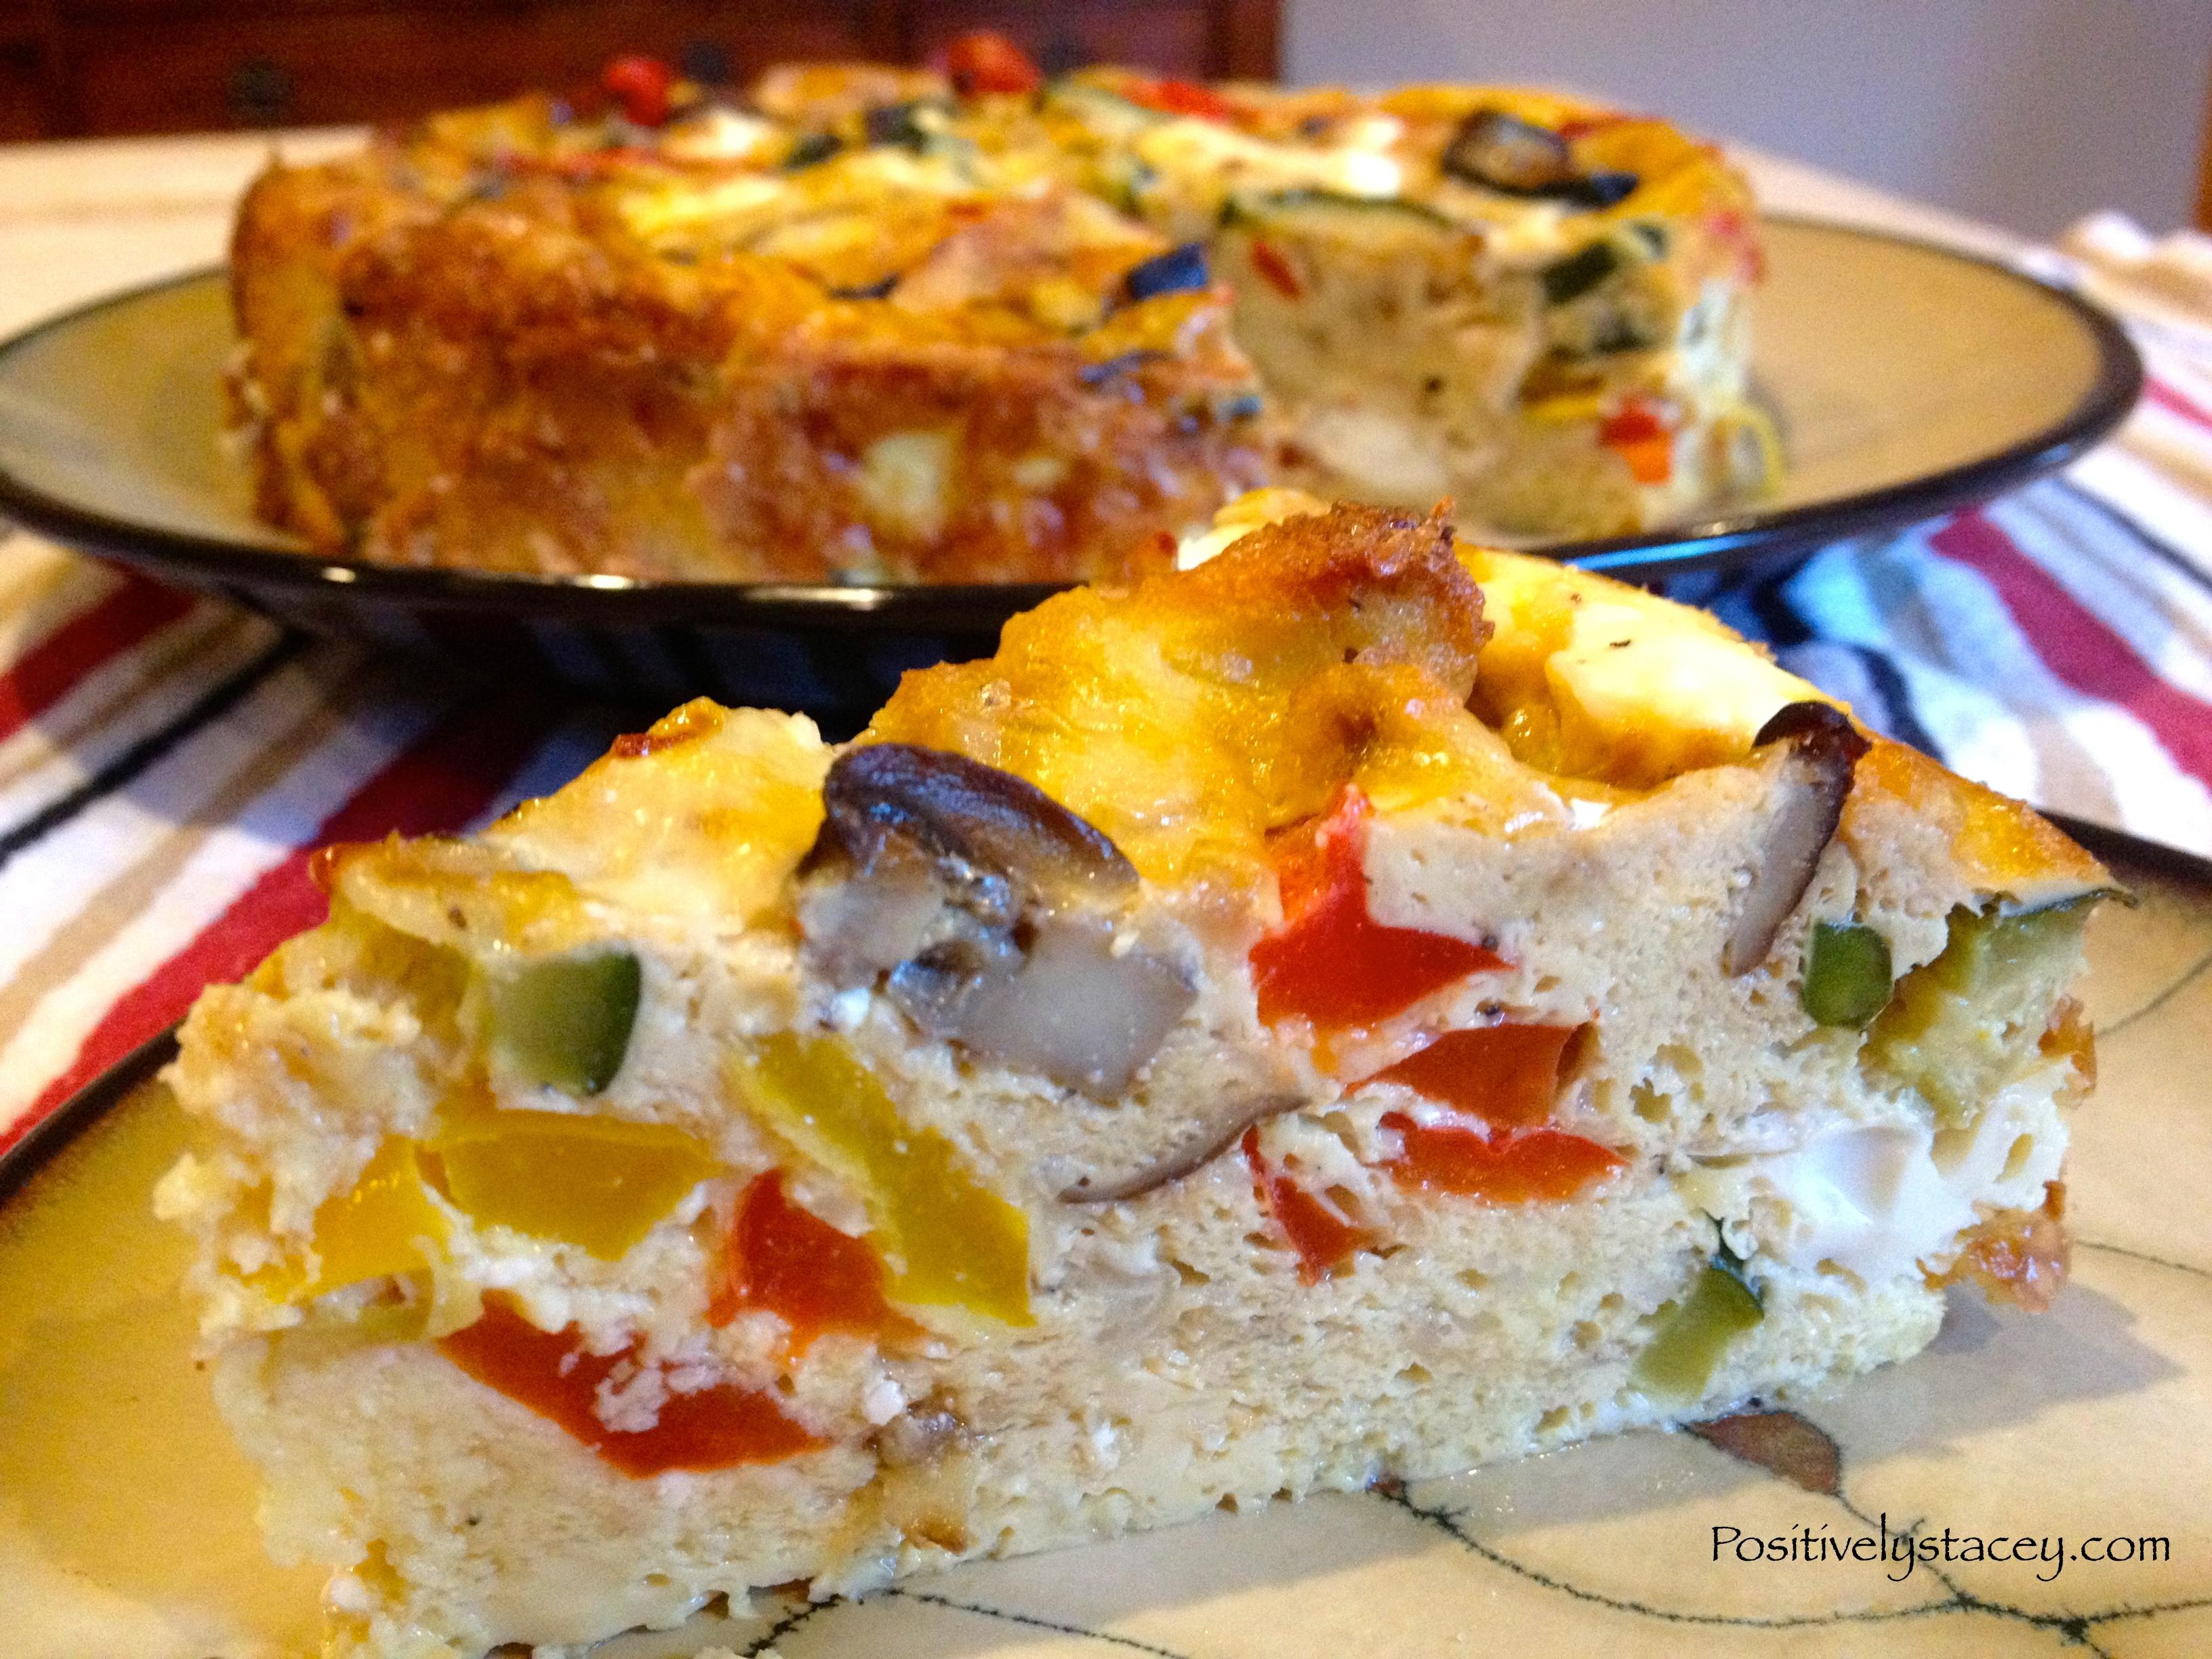 Vegetable Frittata – An Impressive Dish